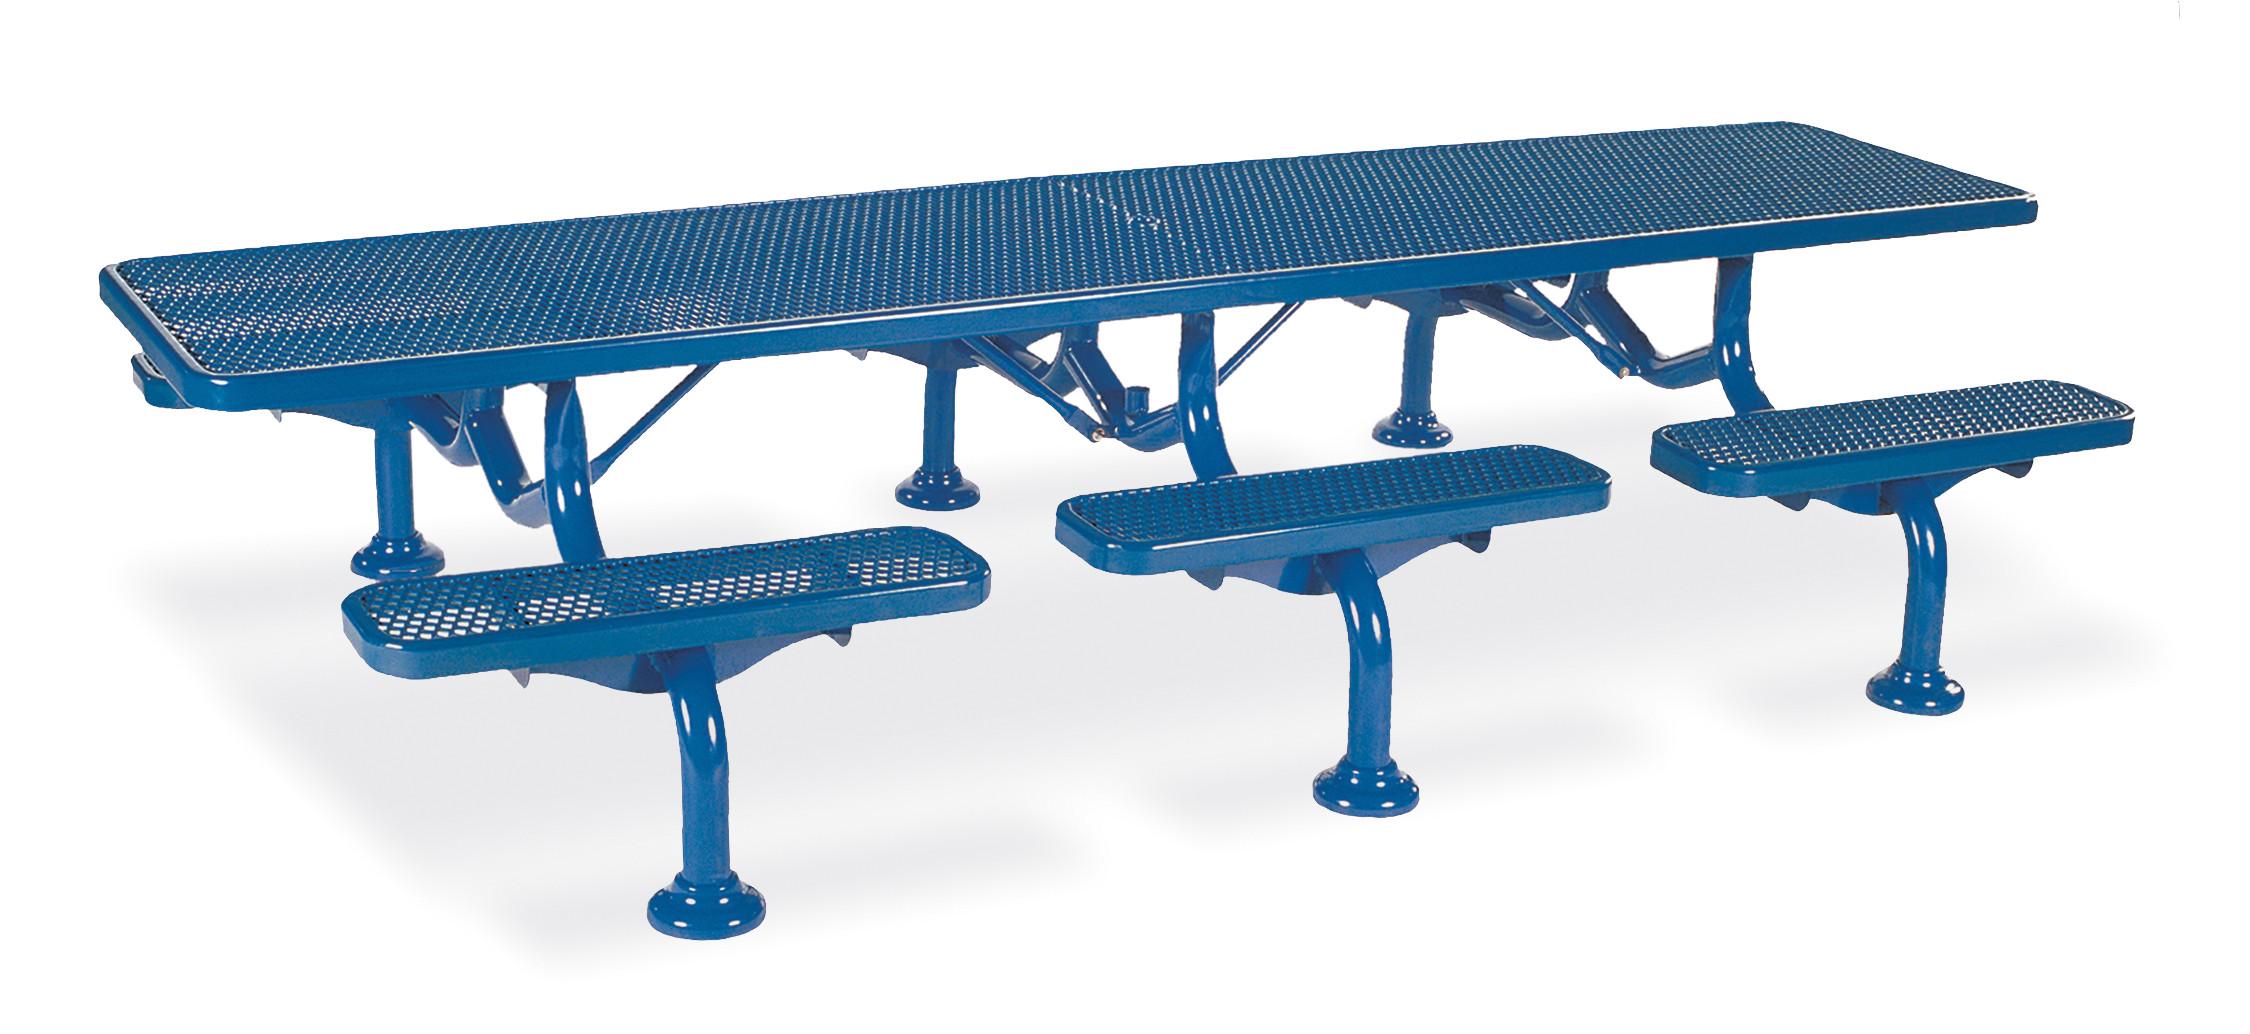 spyder 11 picnic table